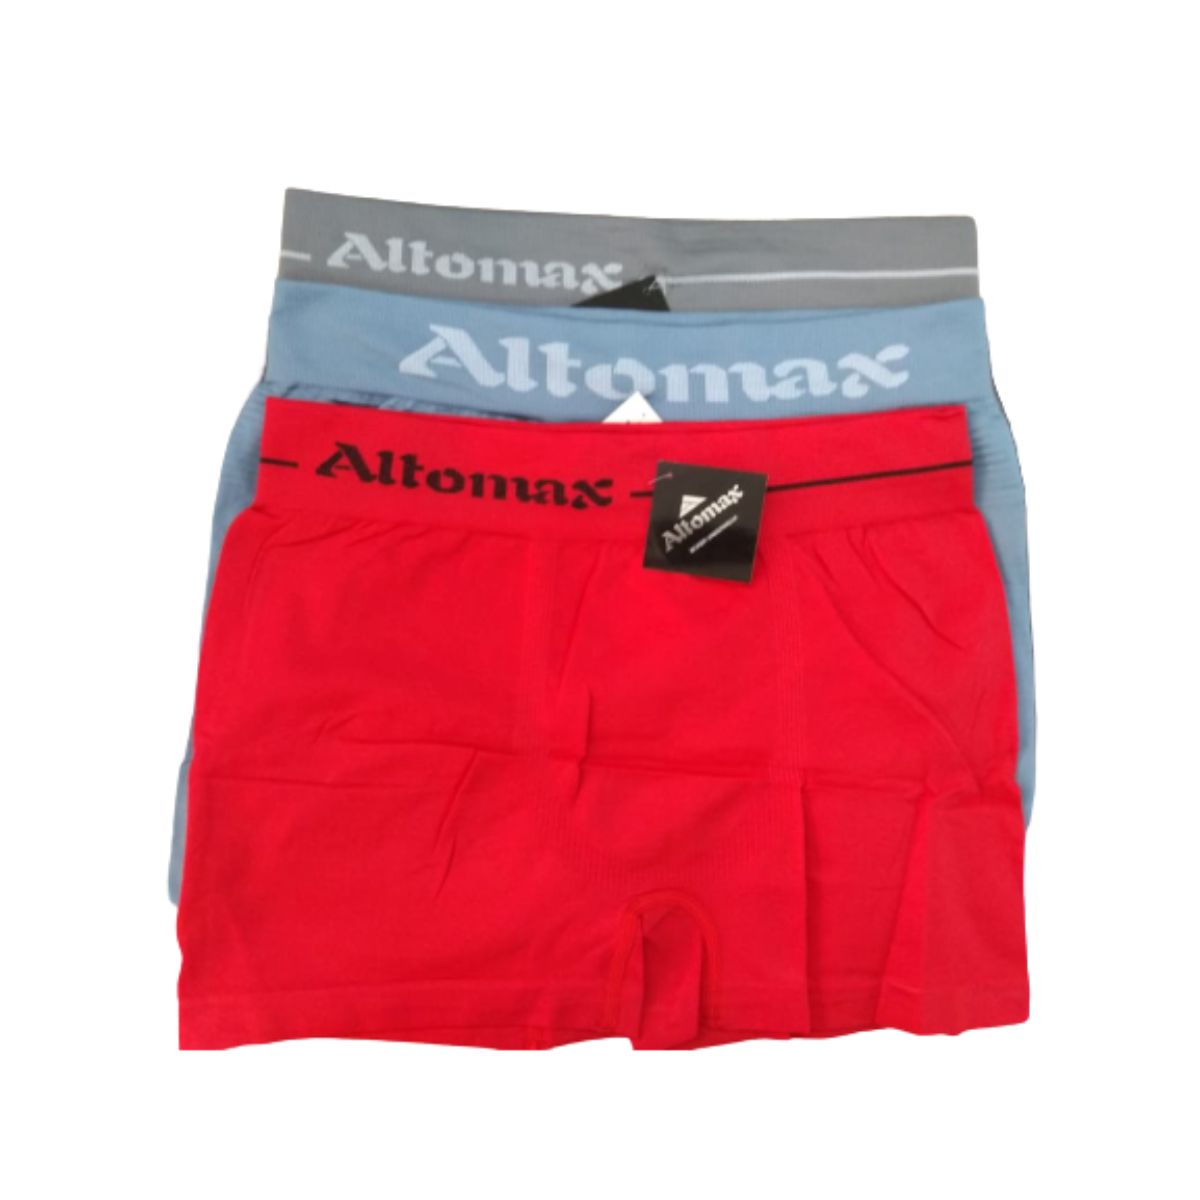 Cueca Boxer Lisa Altomax  Adulto - Kit Com 3 Unidades Sortidas